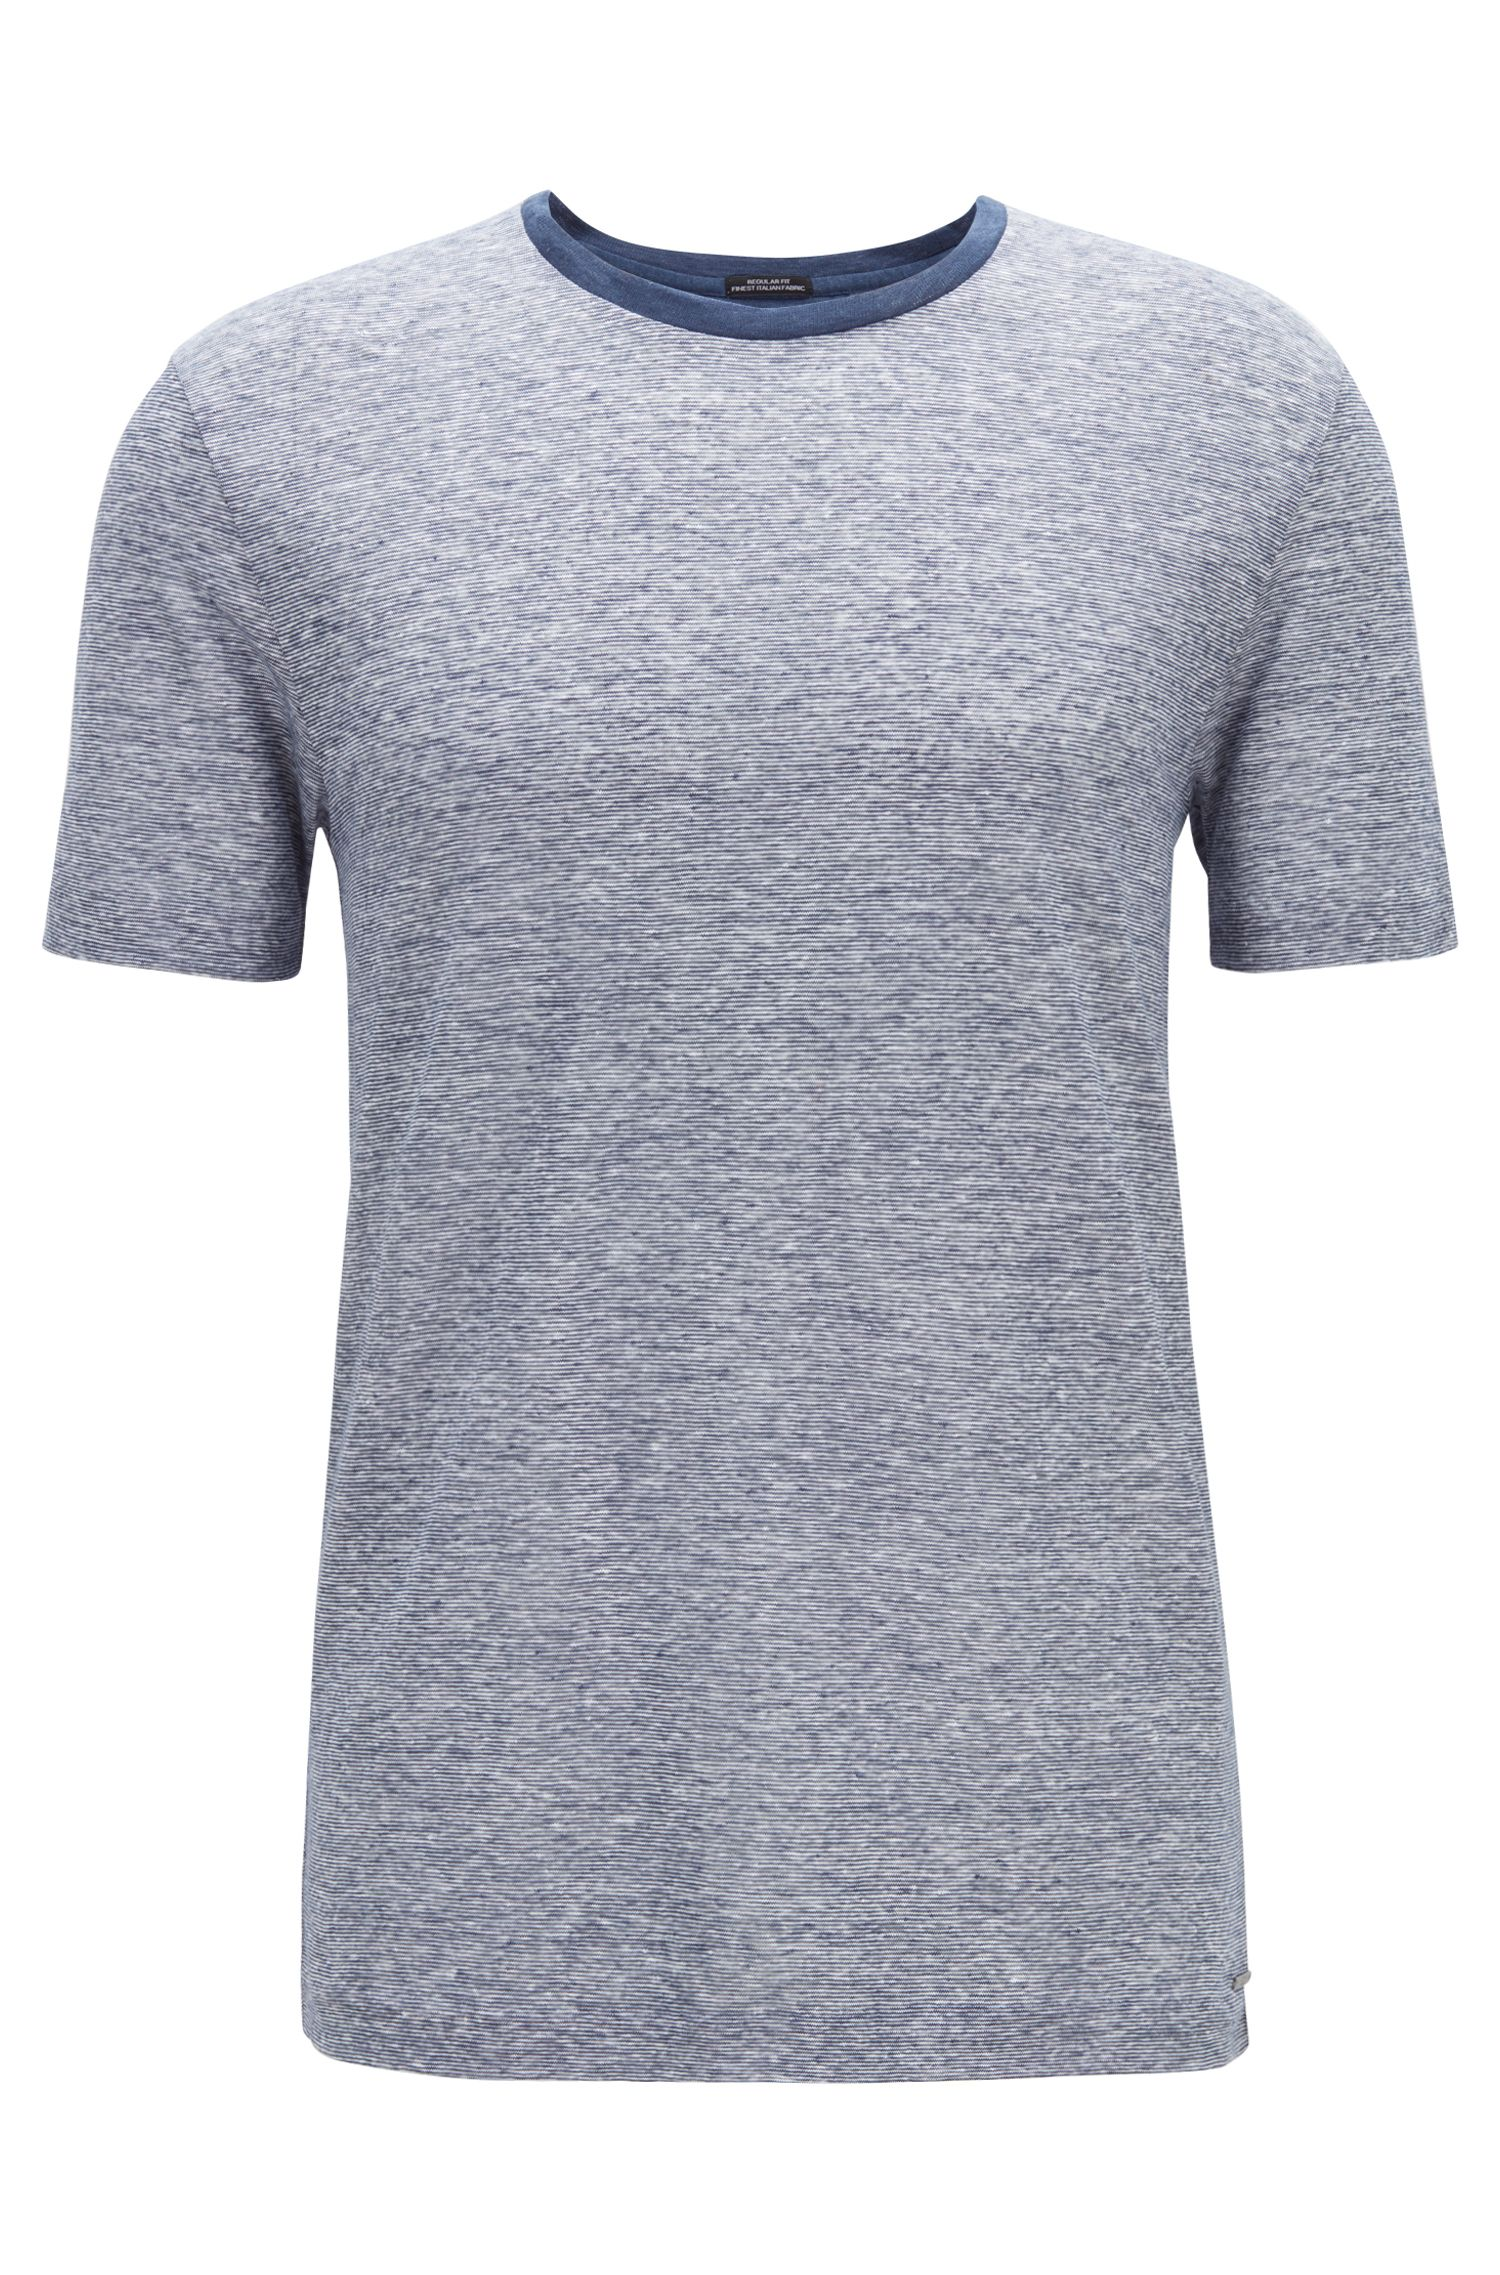 Regular-fit T-shirt in striped Italian linen, Open Blue